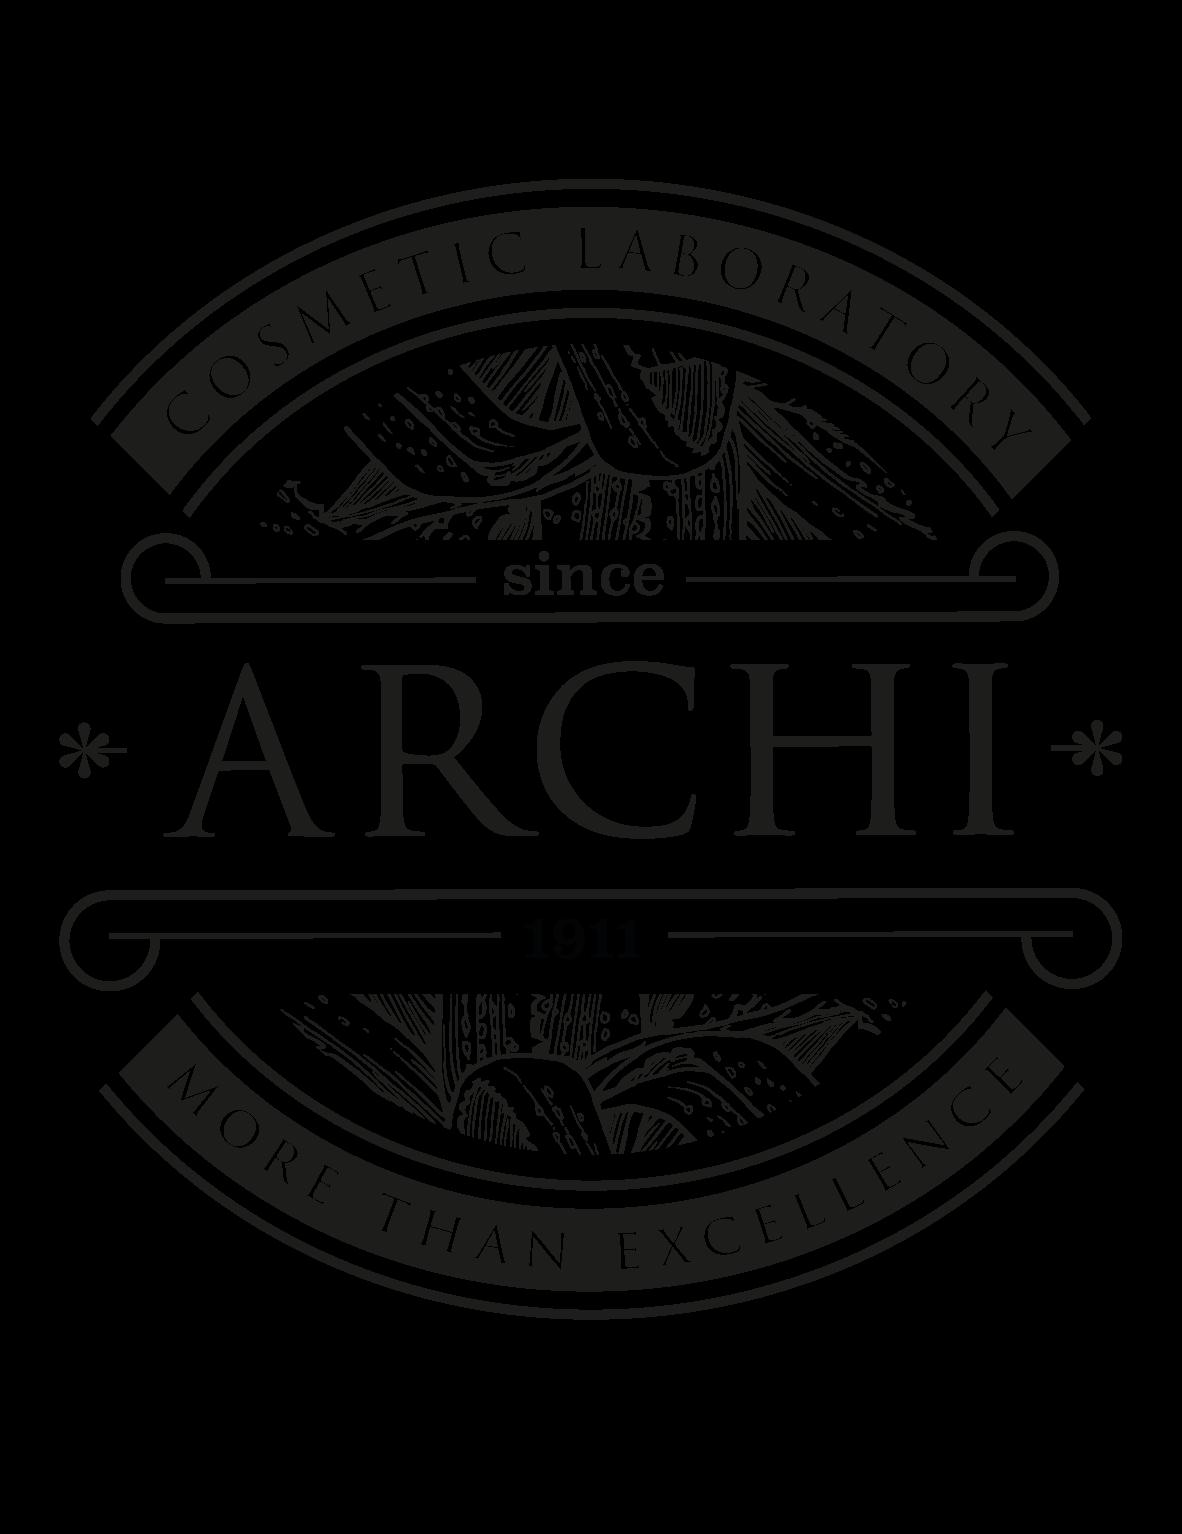 archilab_logo_dark_013x